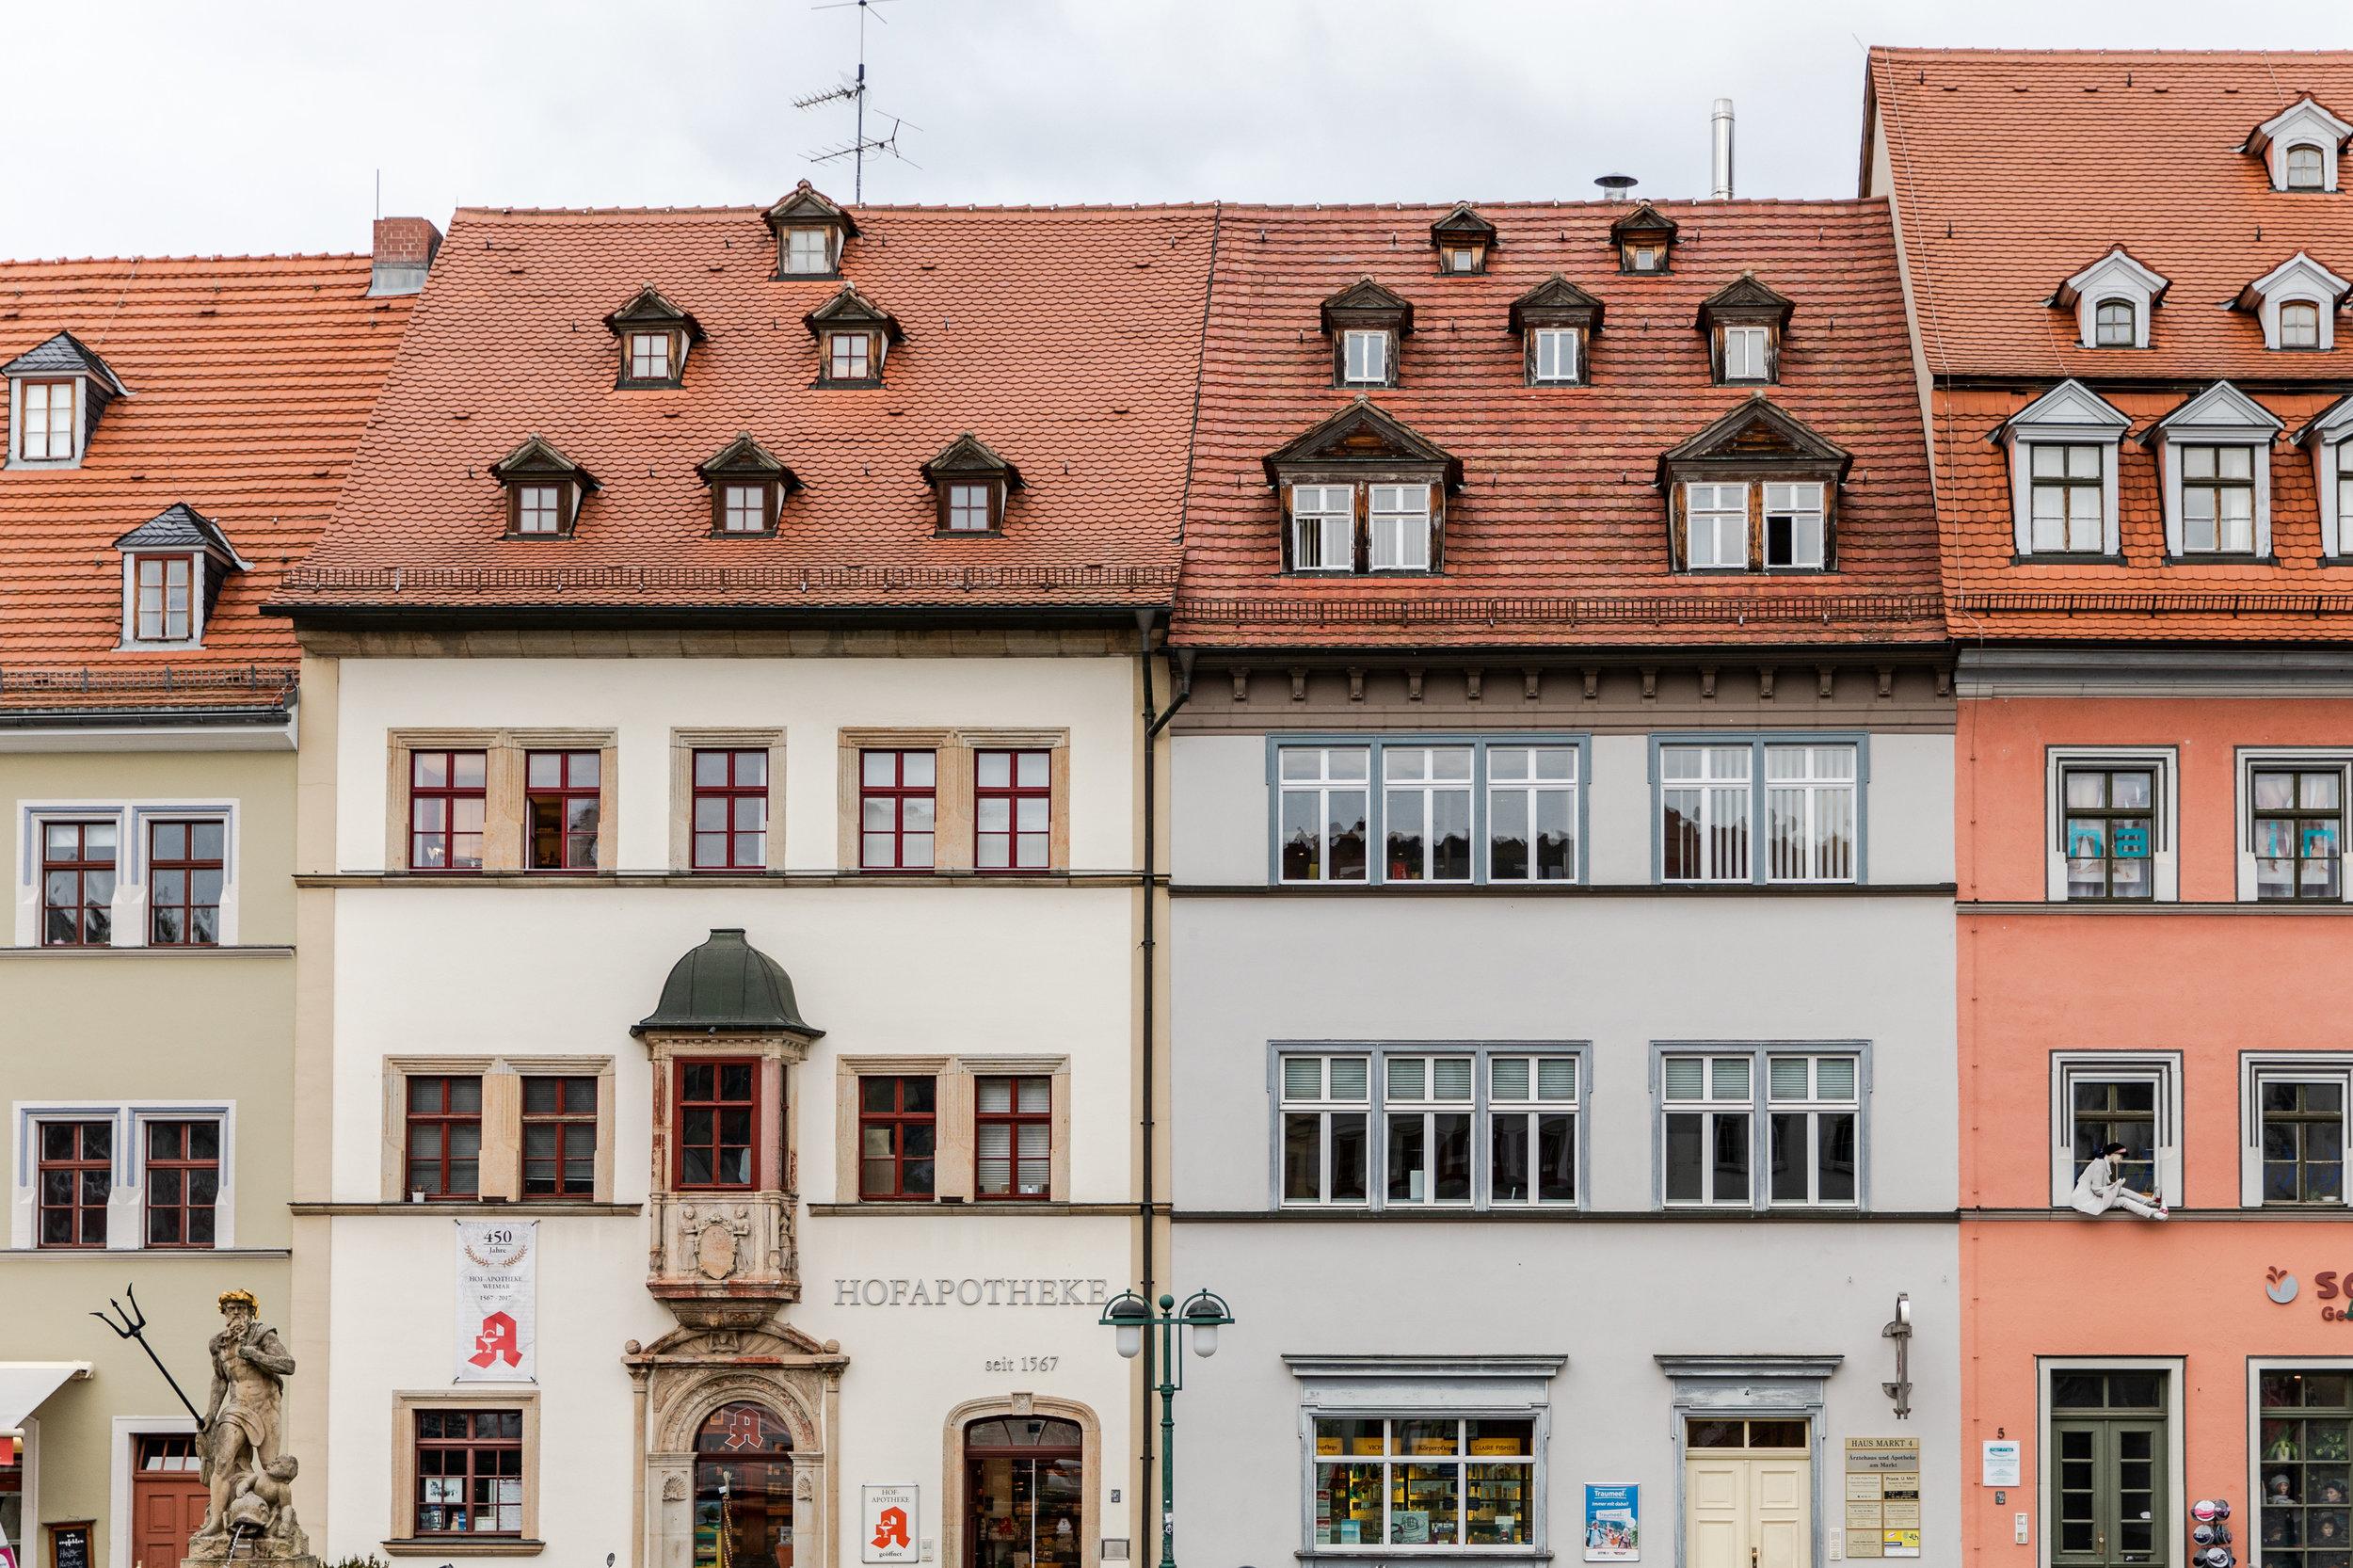 Germany-9068.jpg